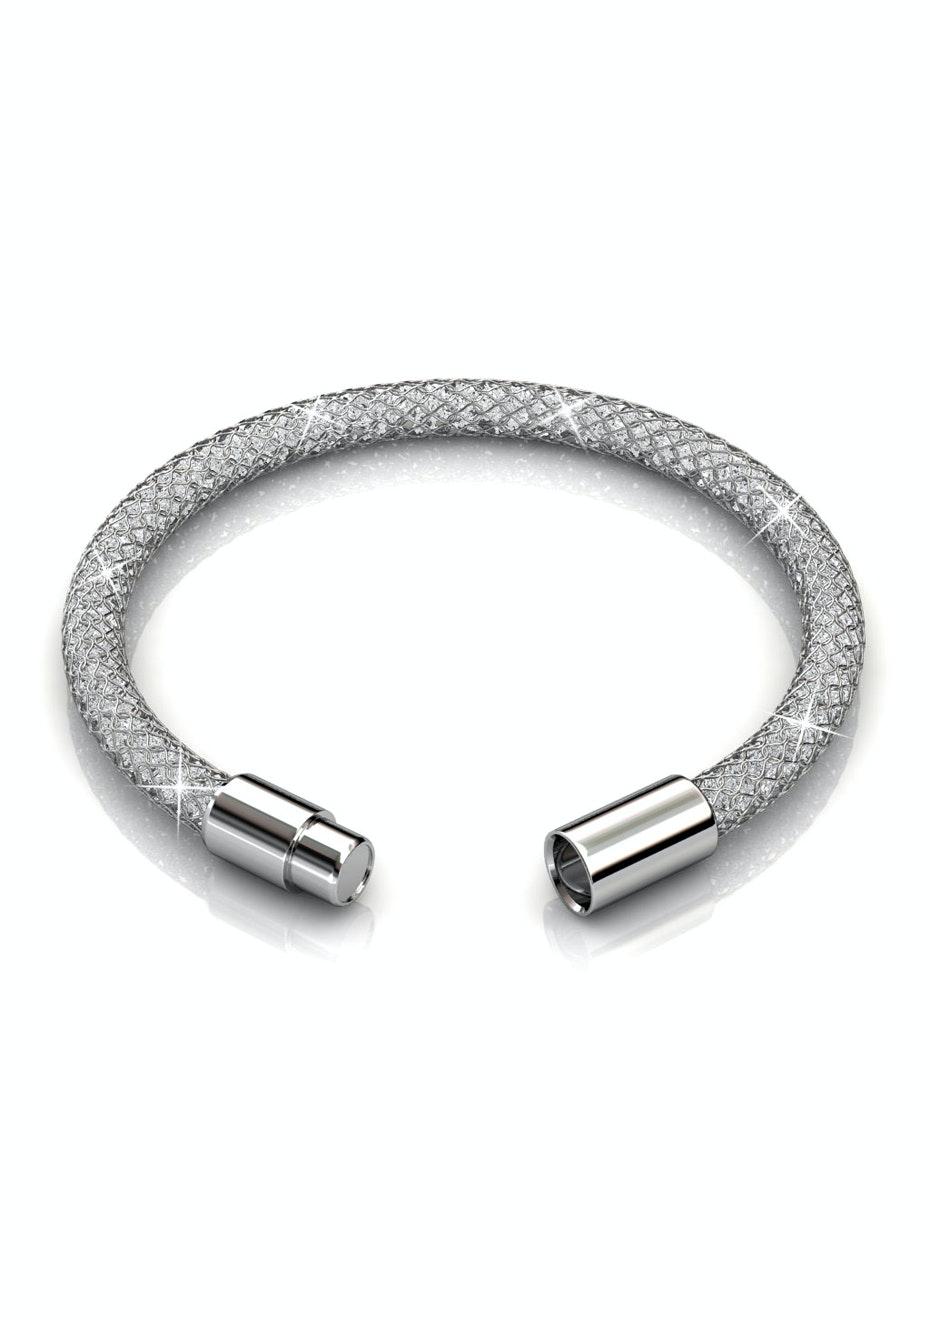 Mesh Single Wrap Bracelet Ft Swarovski Elements-WhtGld